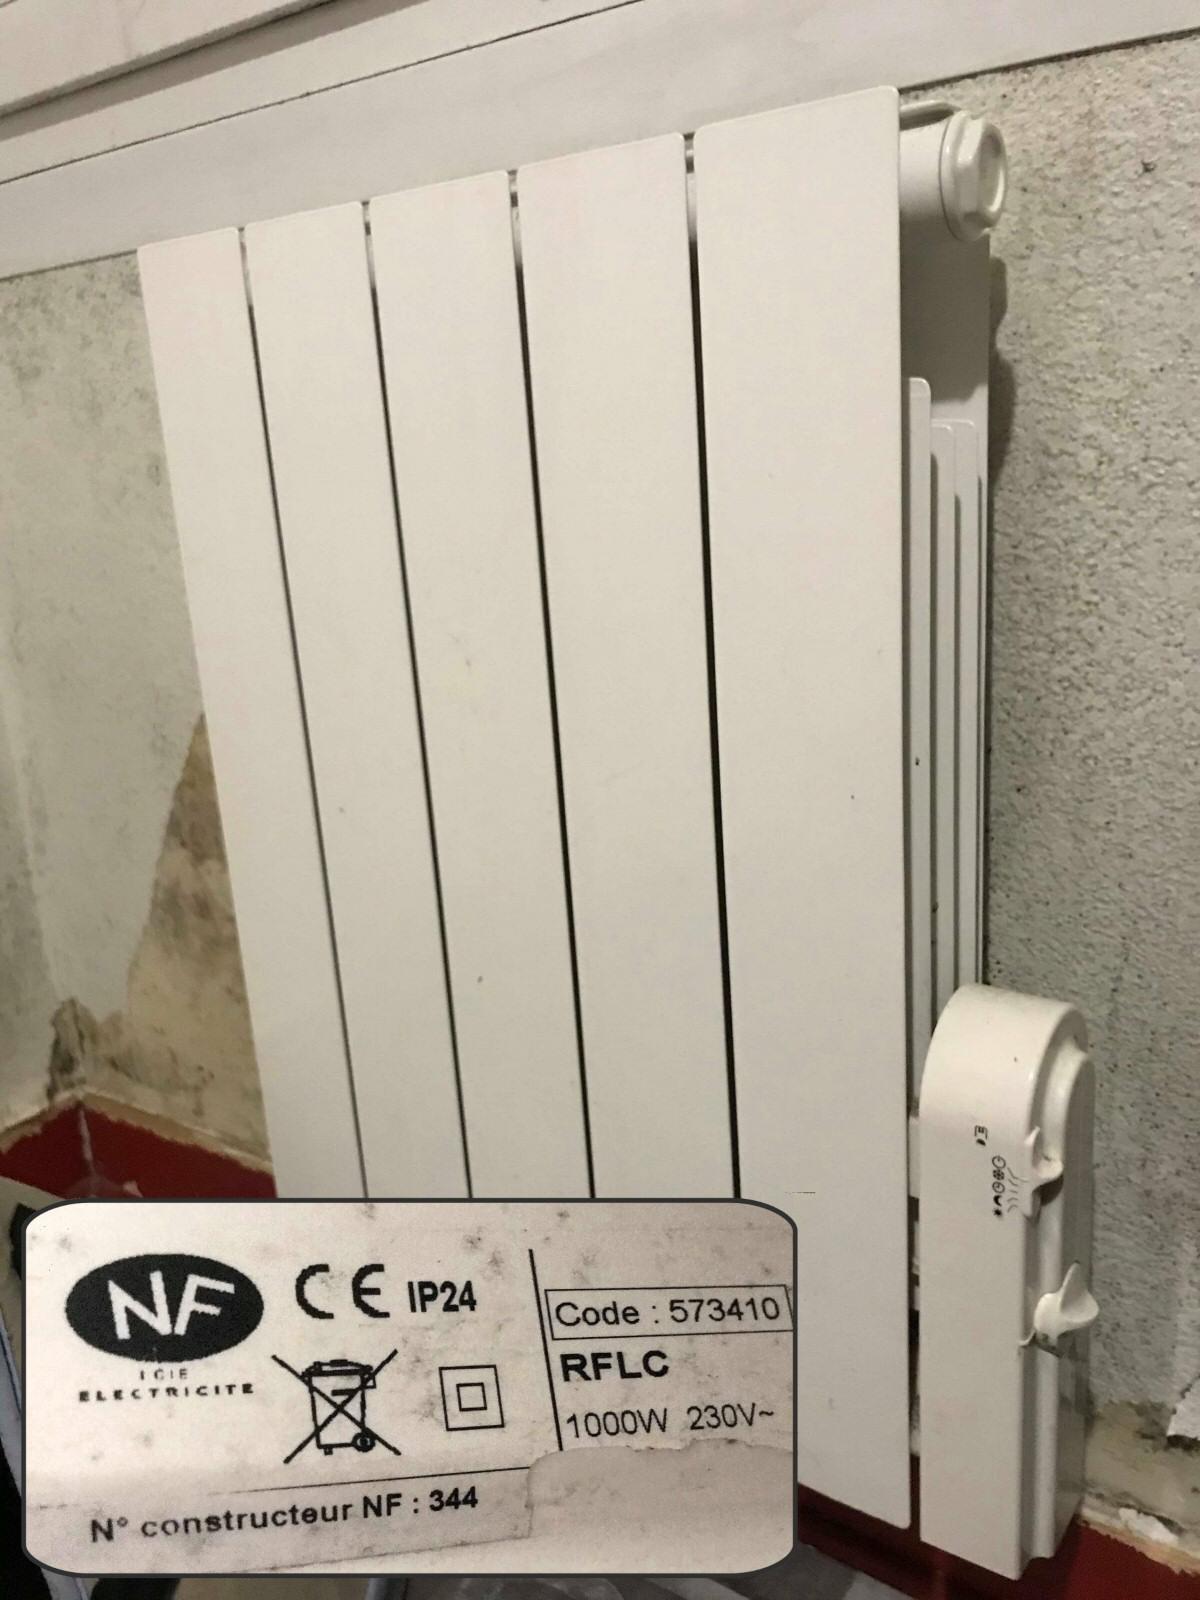 radiateur RFLC code 573410